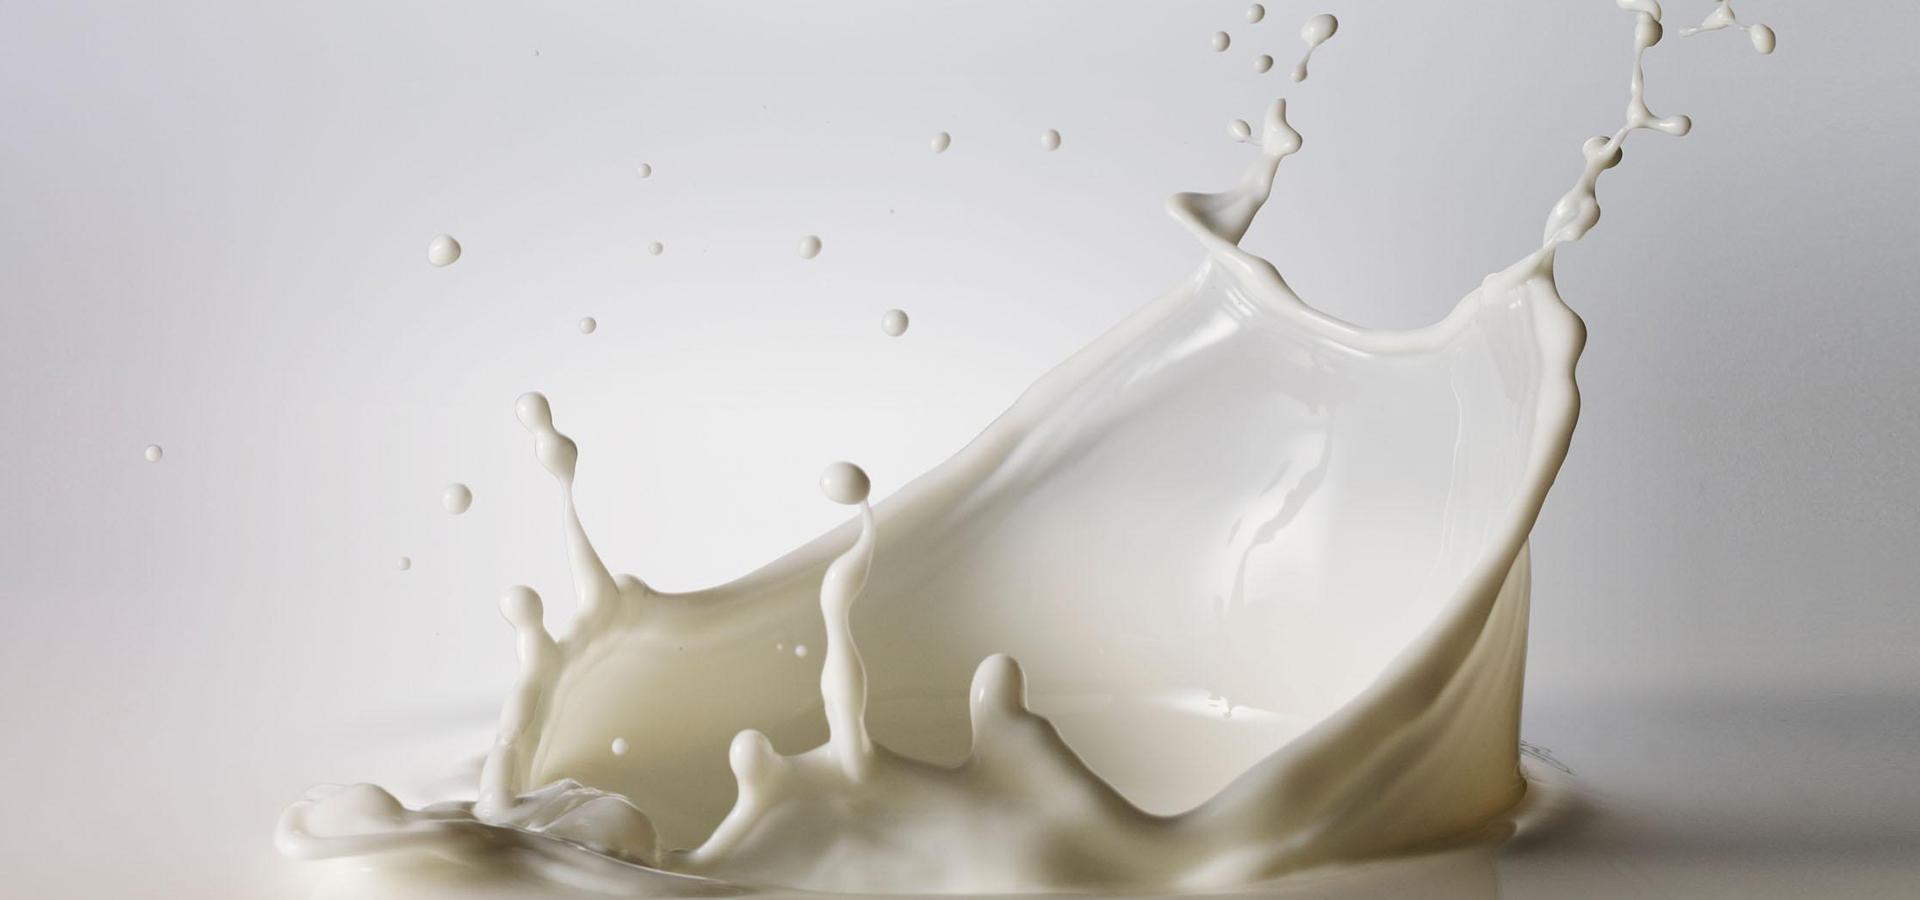 transporte a granel de leche - travesa.es